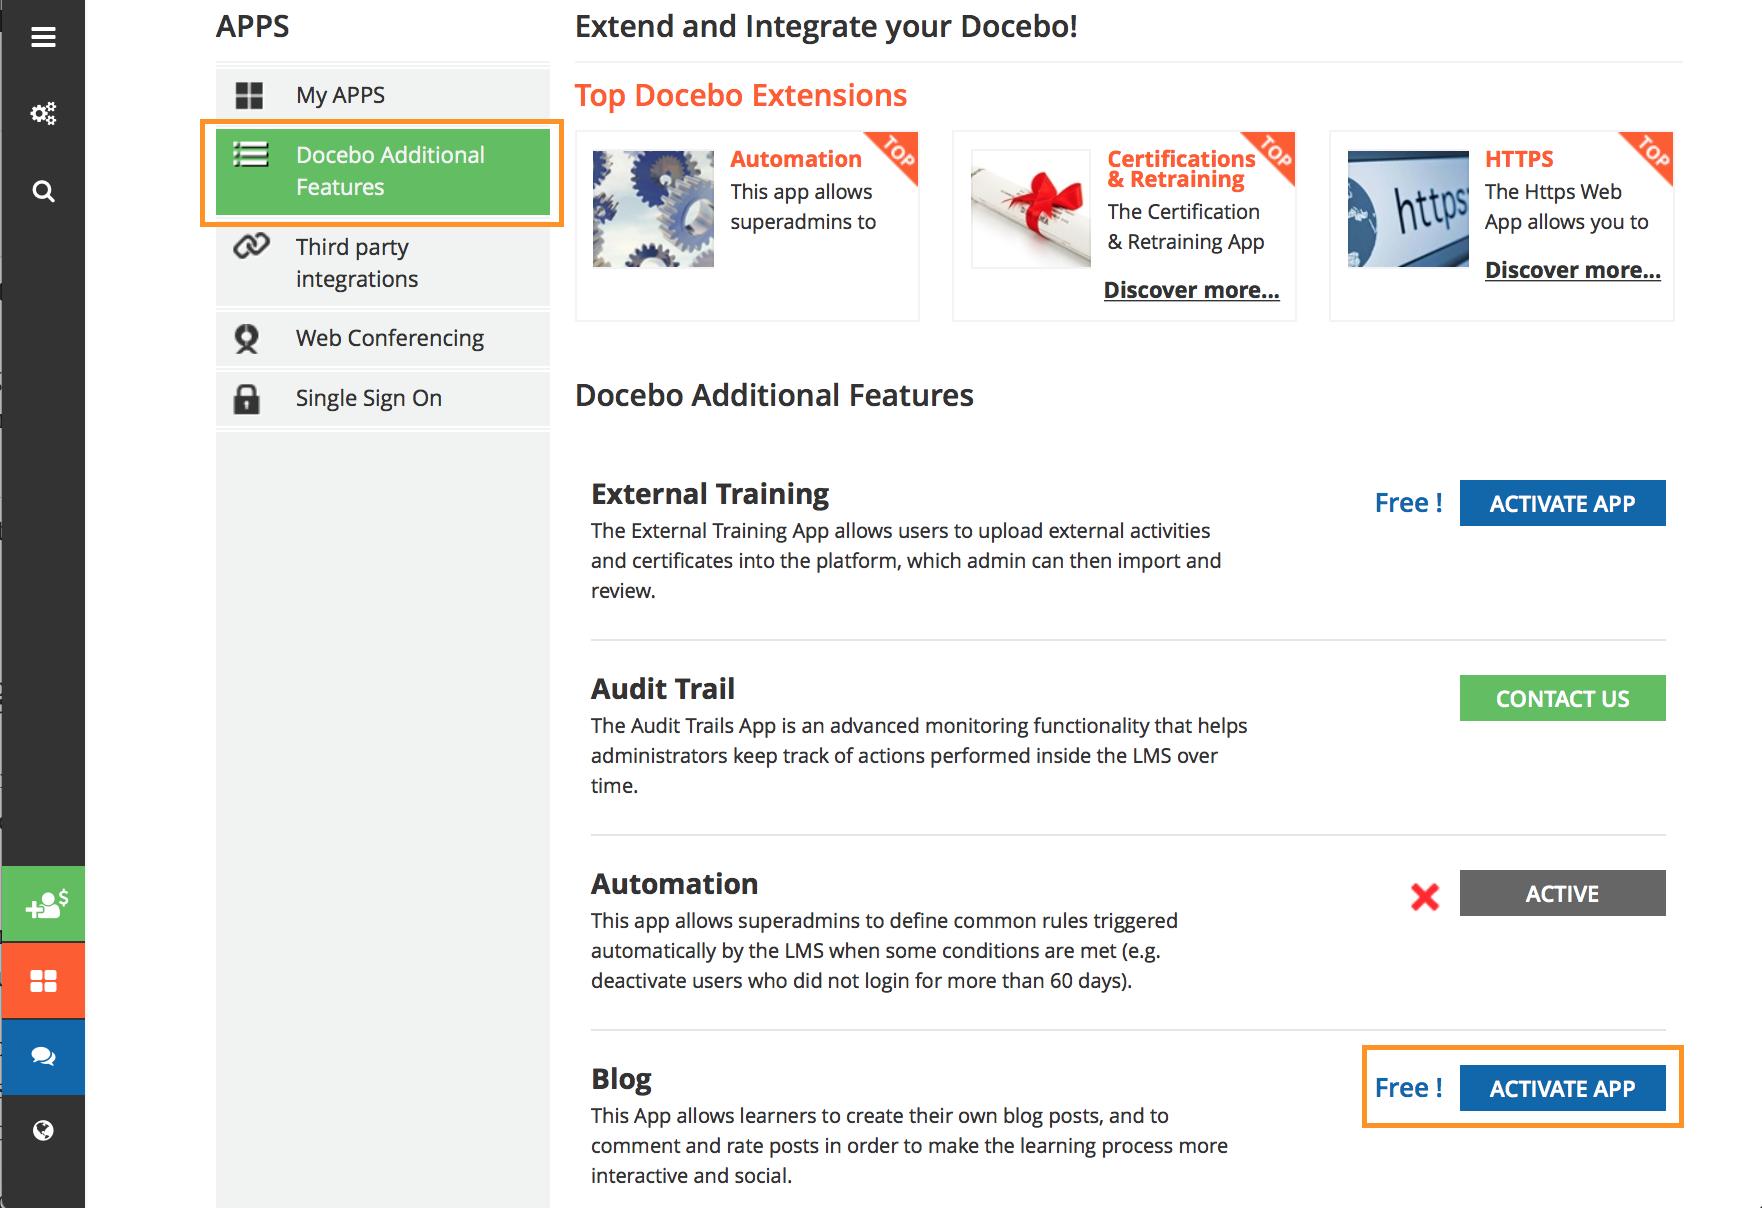 blog activate app